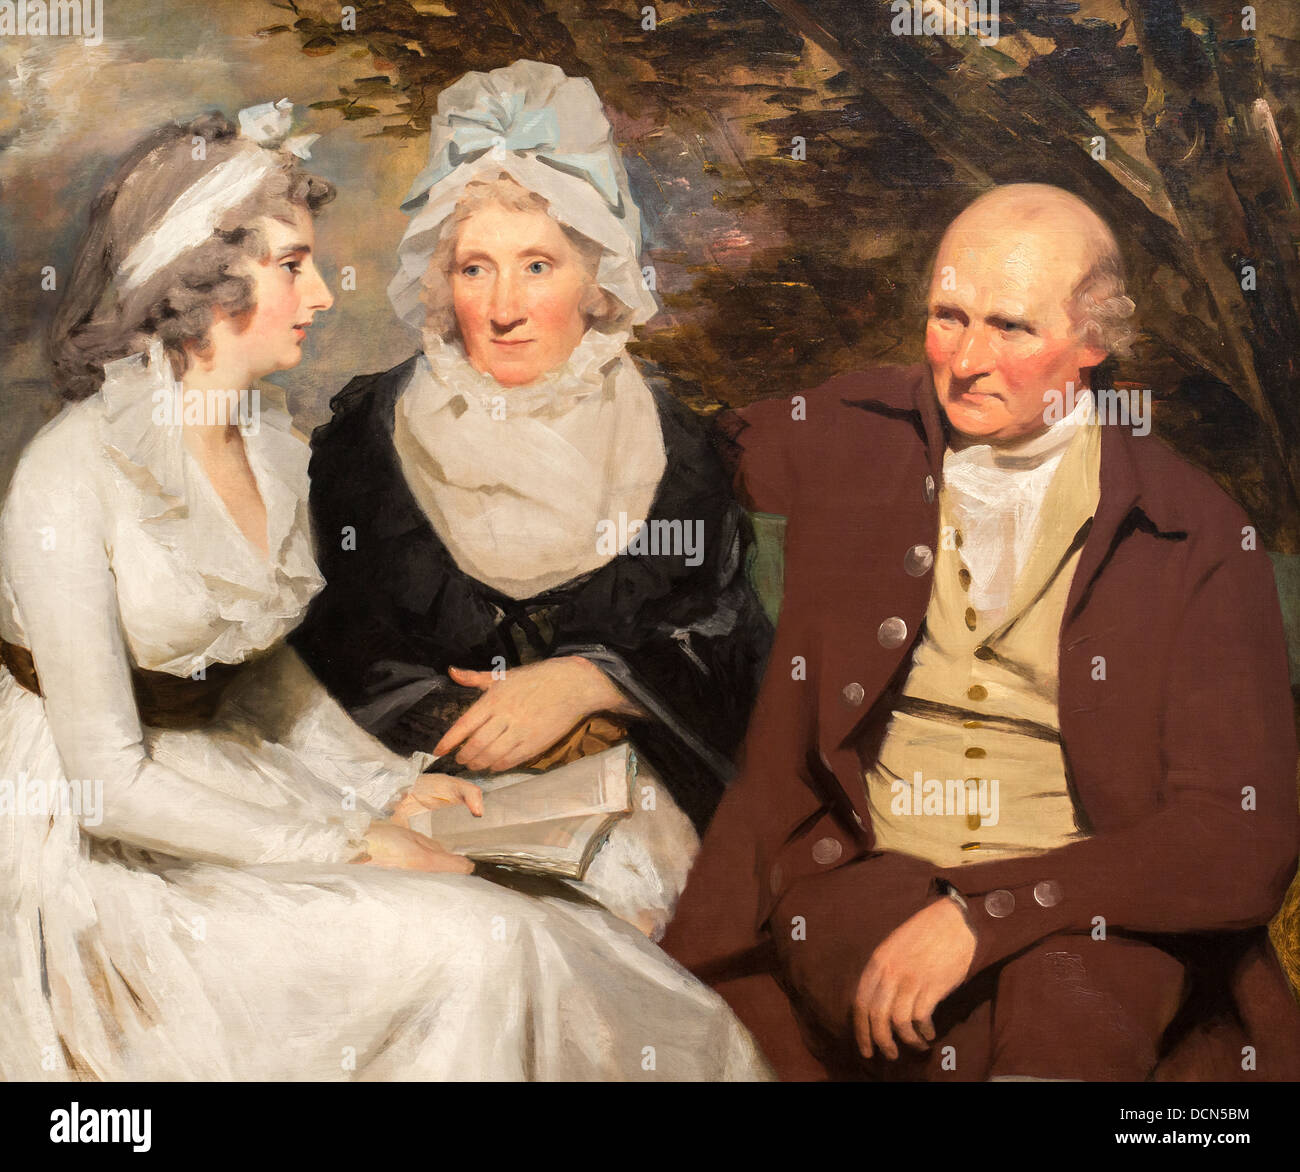 18th century  -  John Johnstone, Betty Johnstone and Miss Wedderburn - Sir Henry Raeburn (1790) - Stock Image